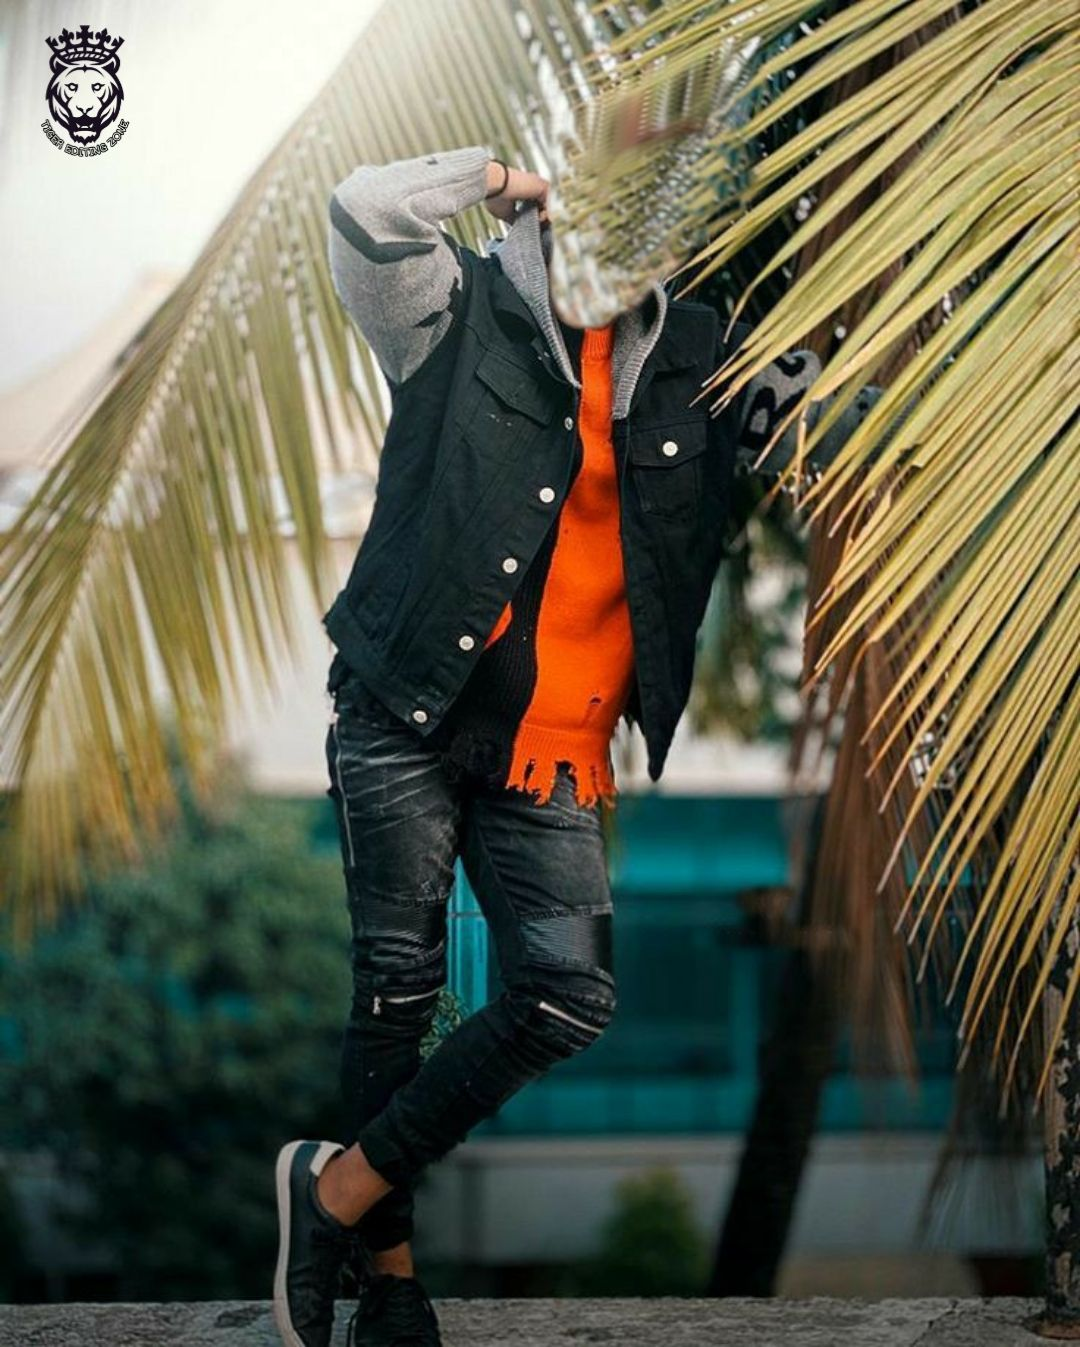 500 Cute Boy Photo Editing Background Hd 2020 Vijay Maher Background Hd Cute Boy Photo Photo Poses For Boy Photoshoot Pose Boy